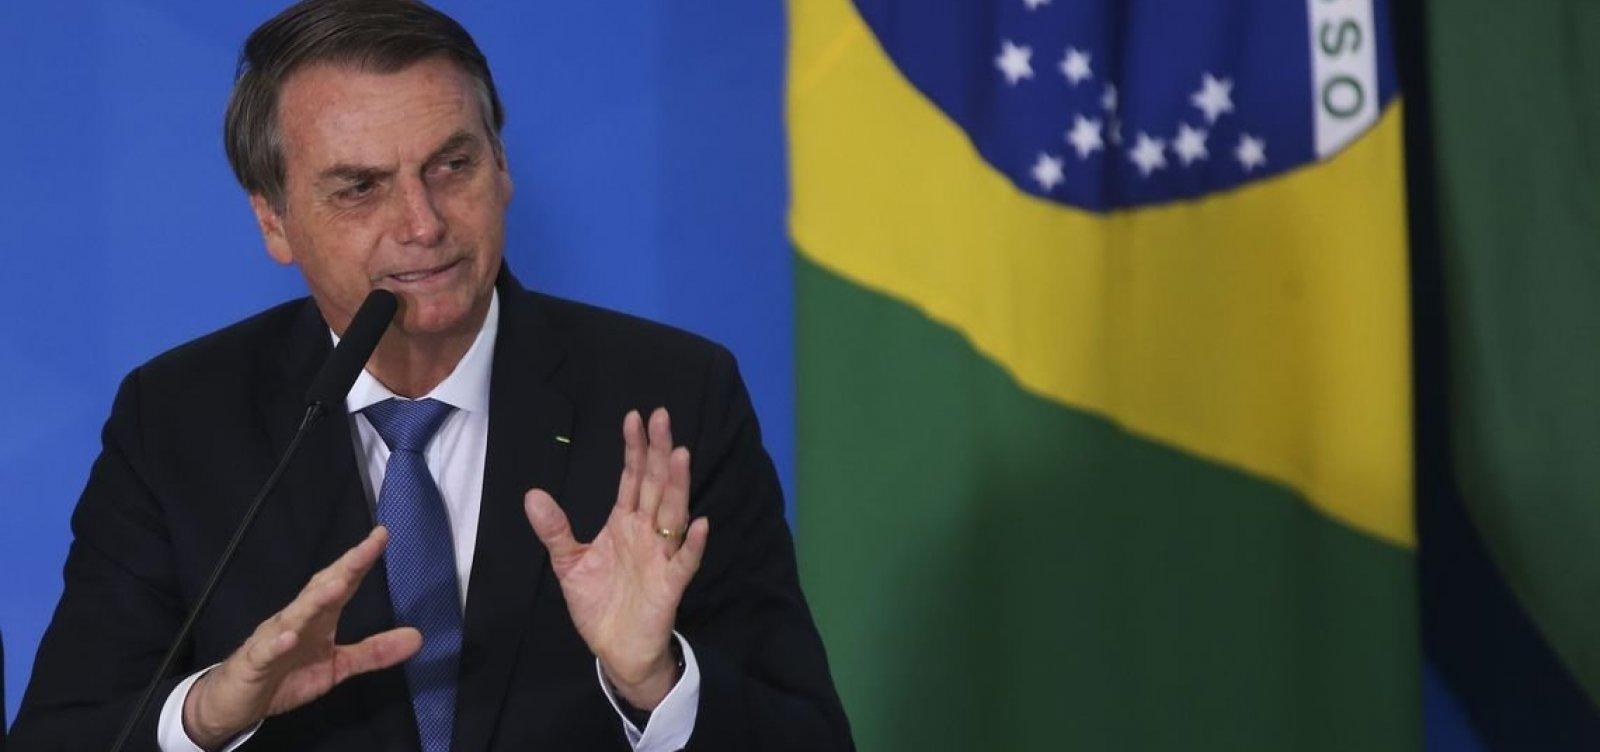 [Congresso derruba veto de Bolsonaro sobre fundo eleitoral]